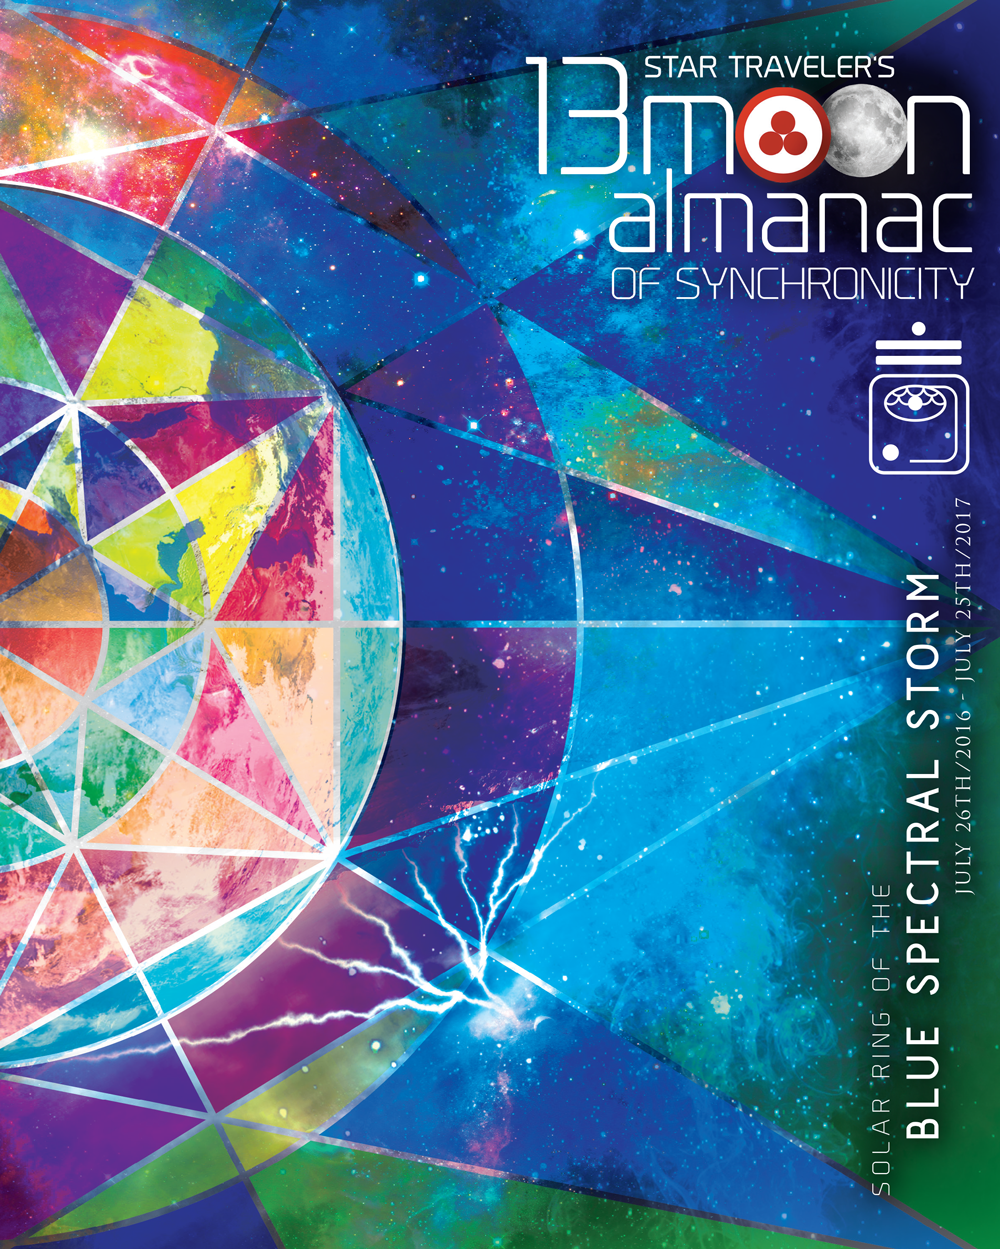 spectral-storm-year-almanac